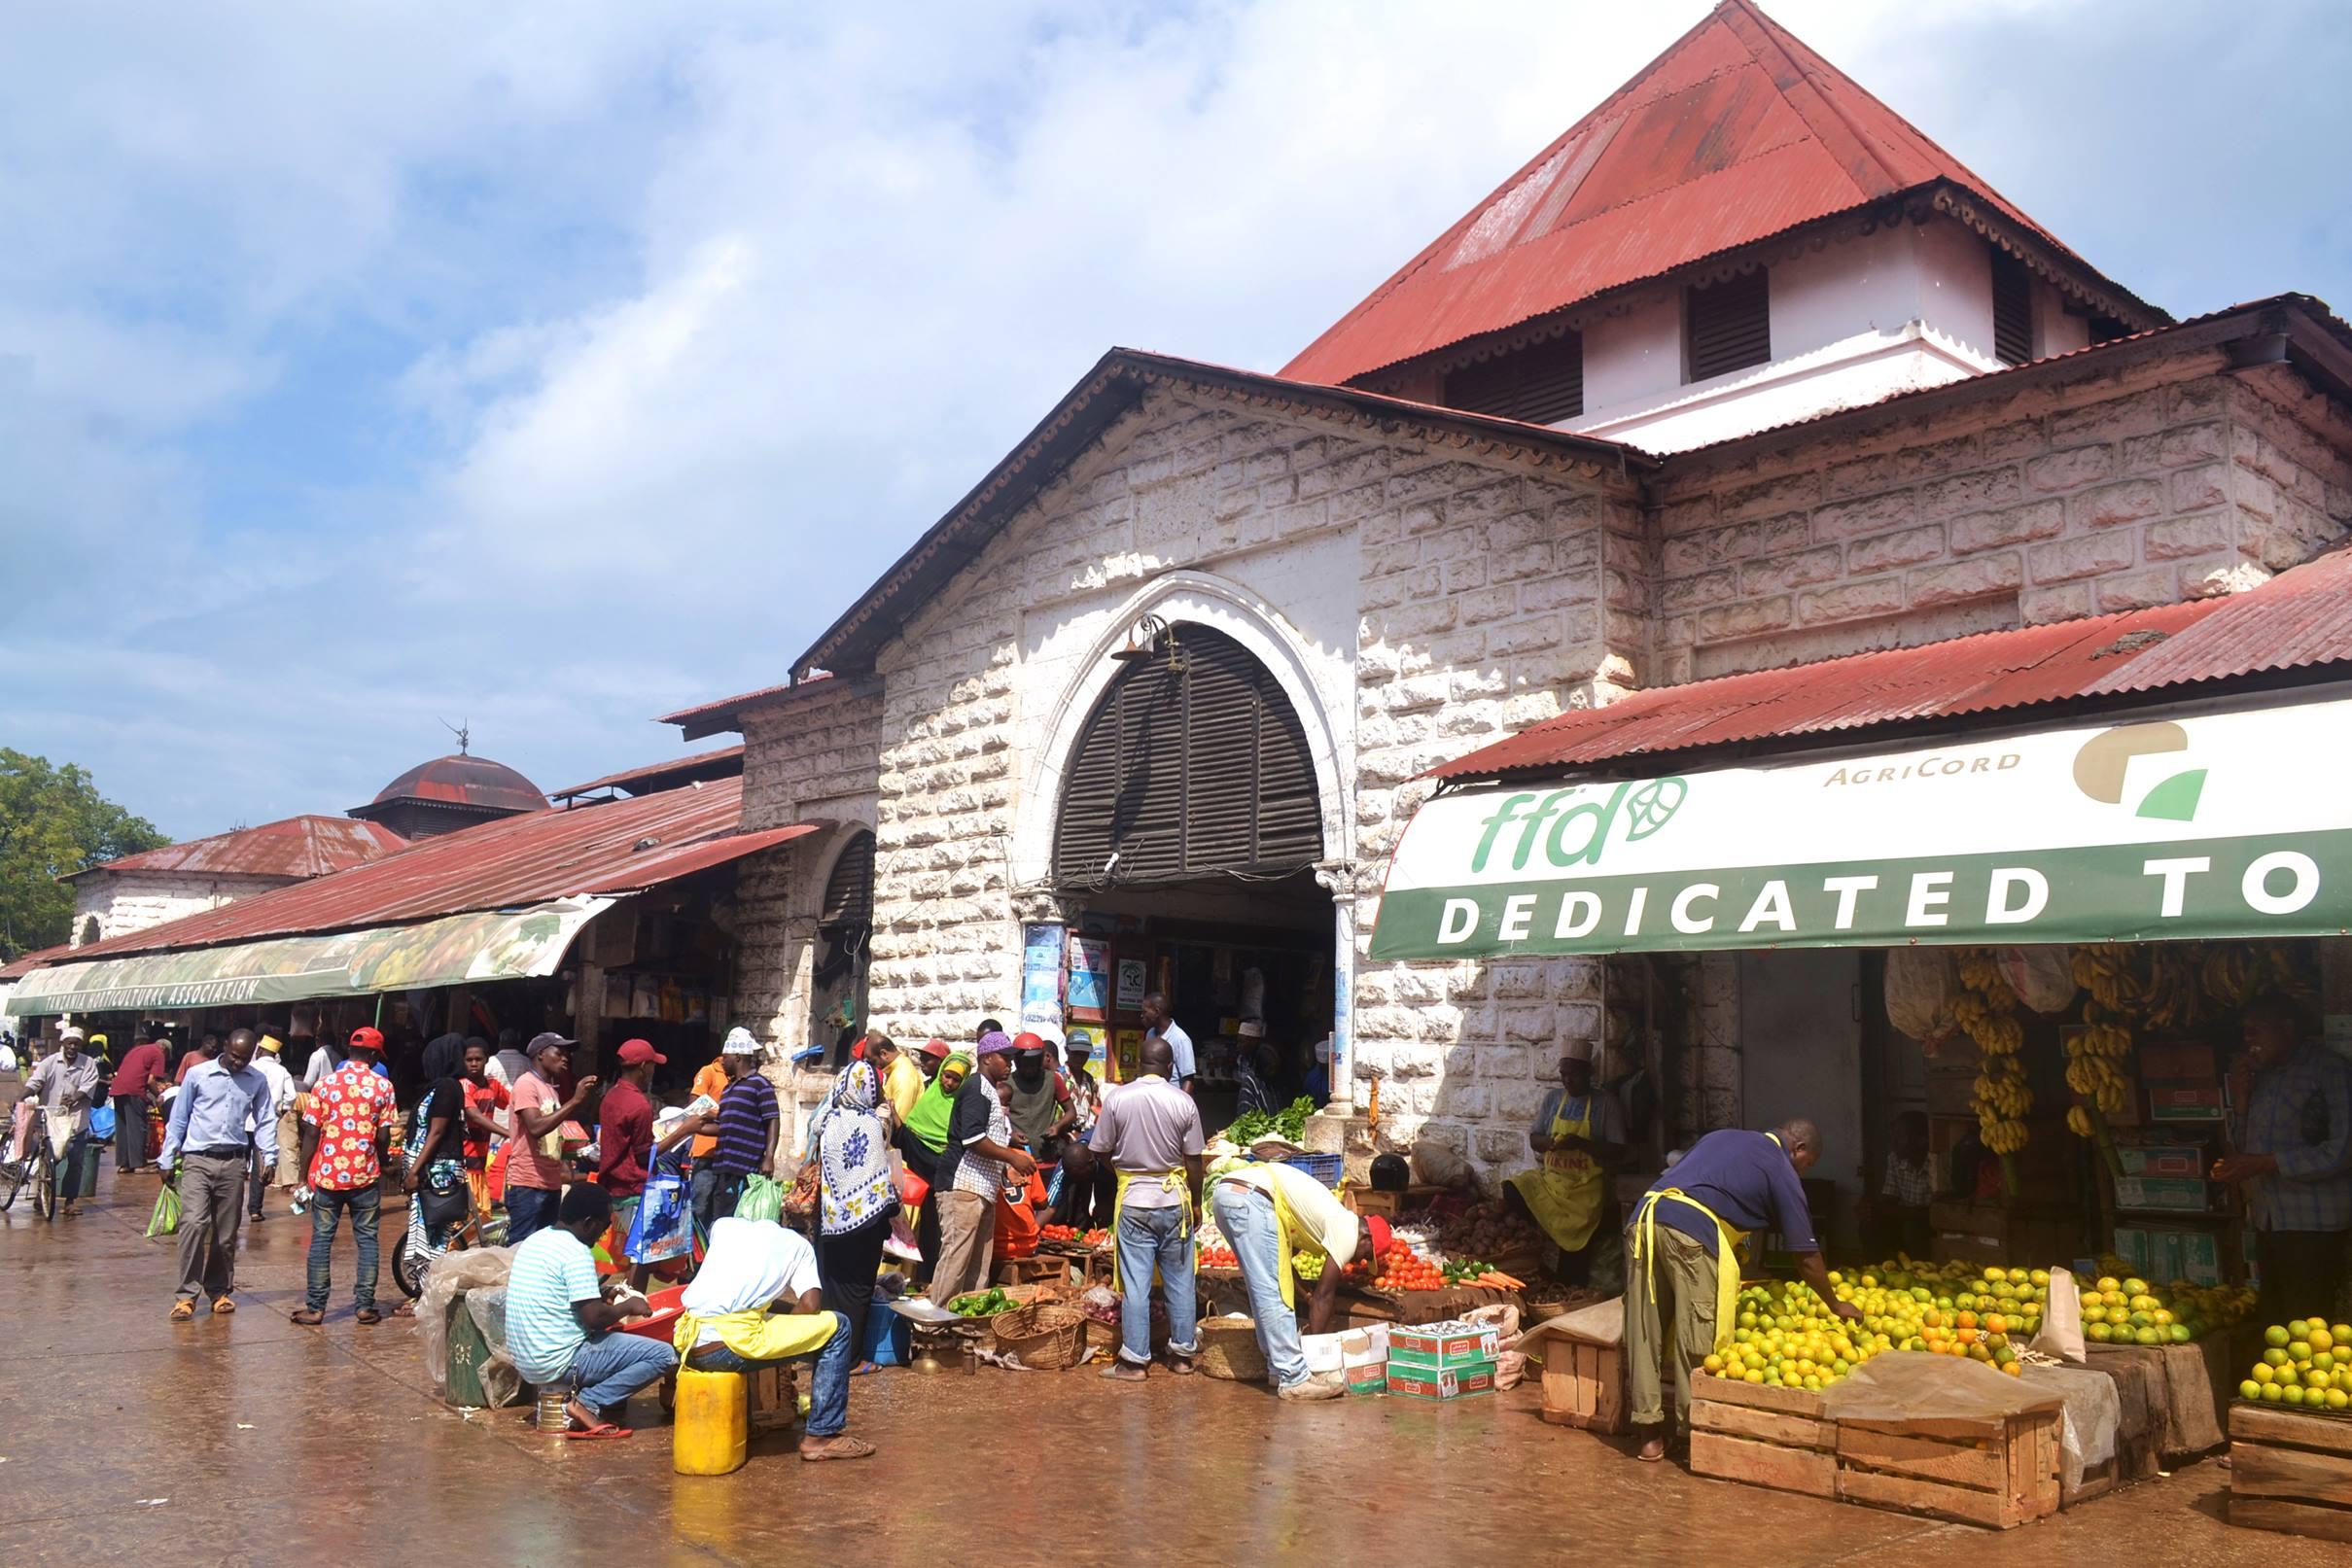 zanzibar_tanzania_darajanimarket_1